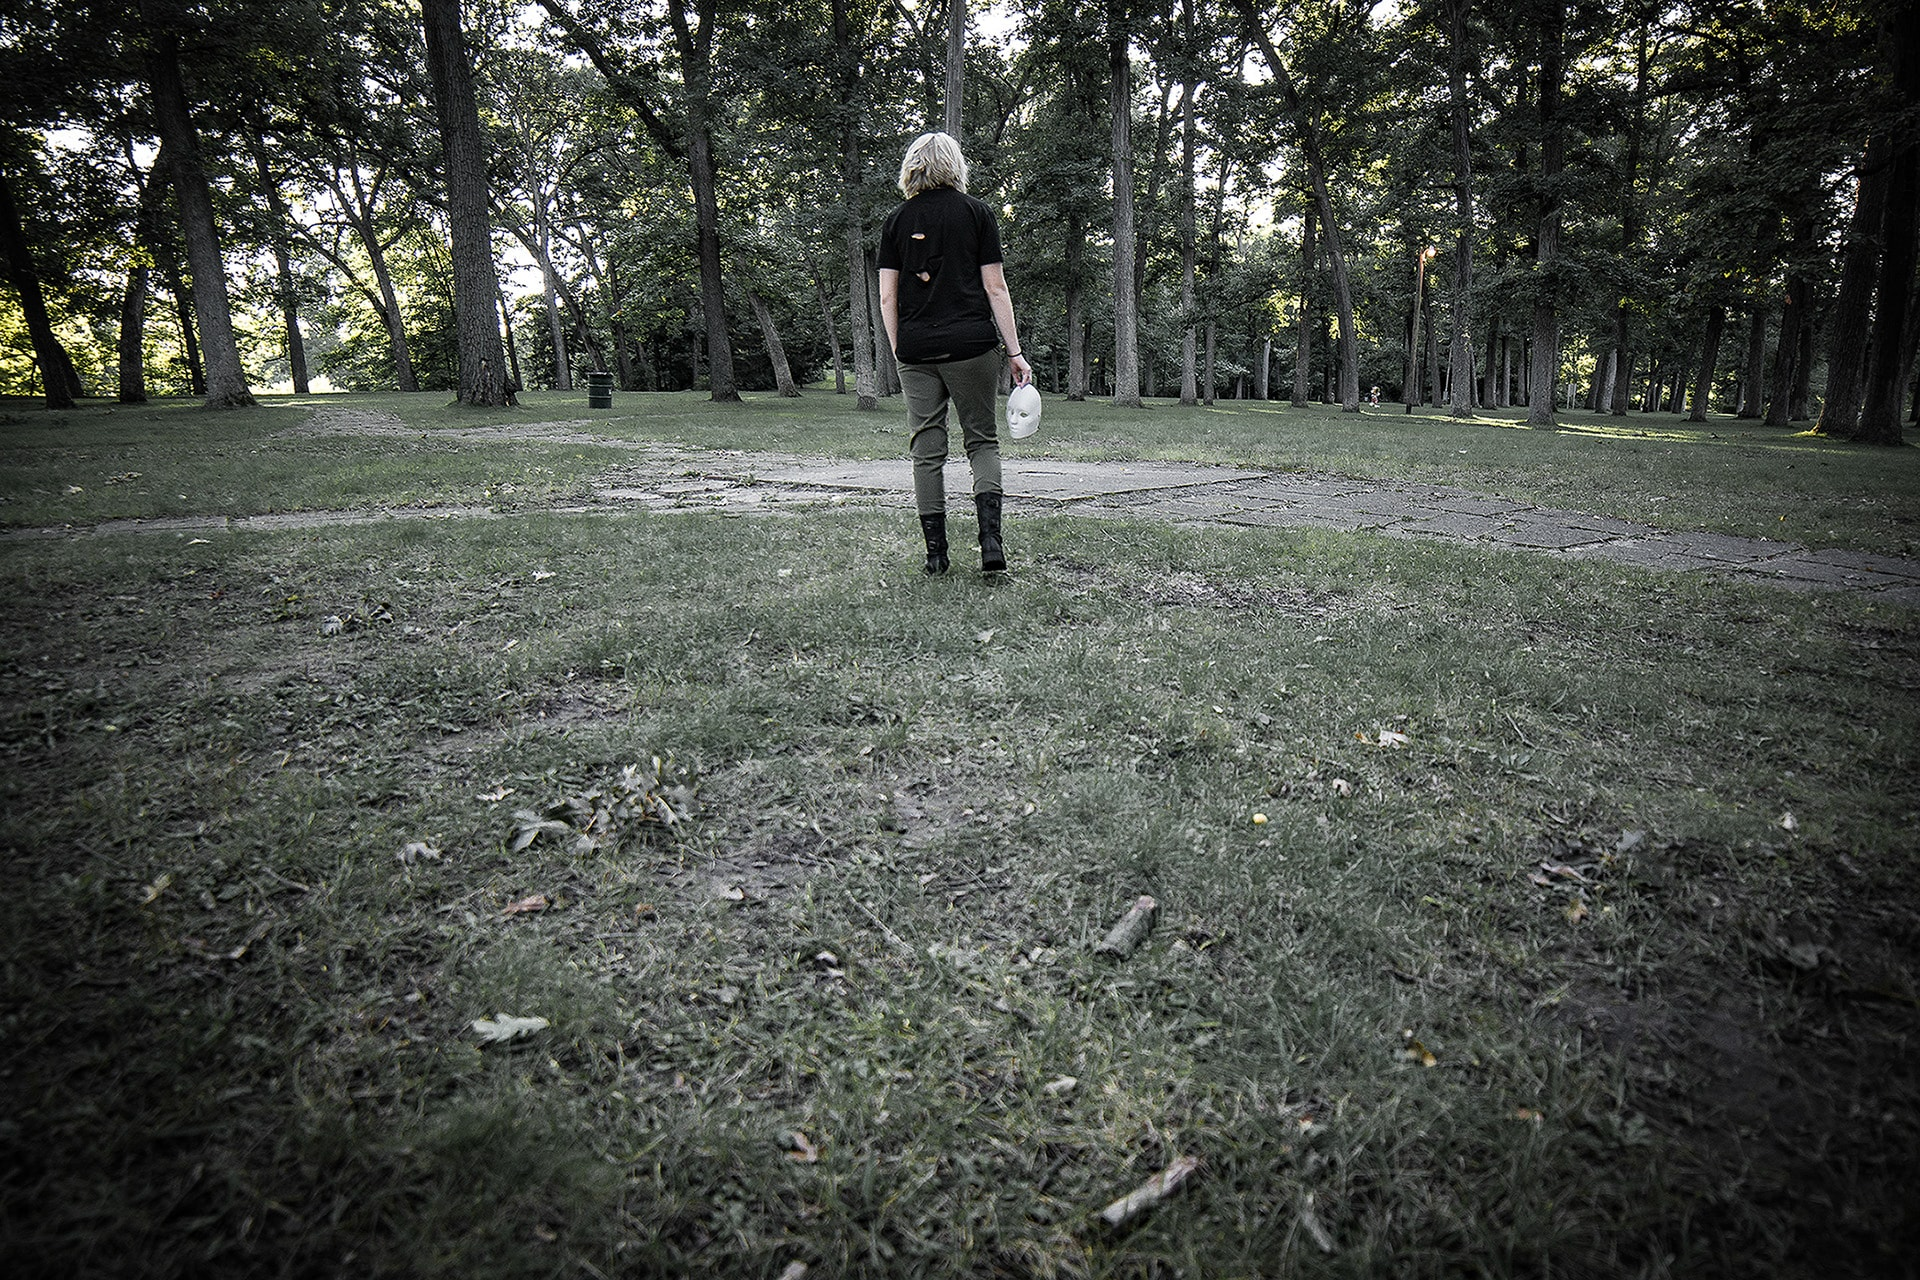 simpson-h-woods-creep-1-iphone-13-min.jpg